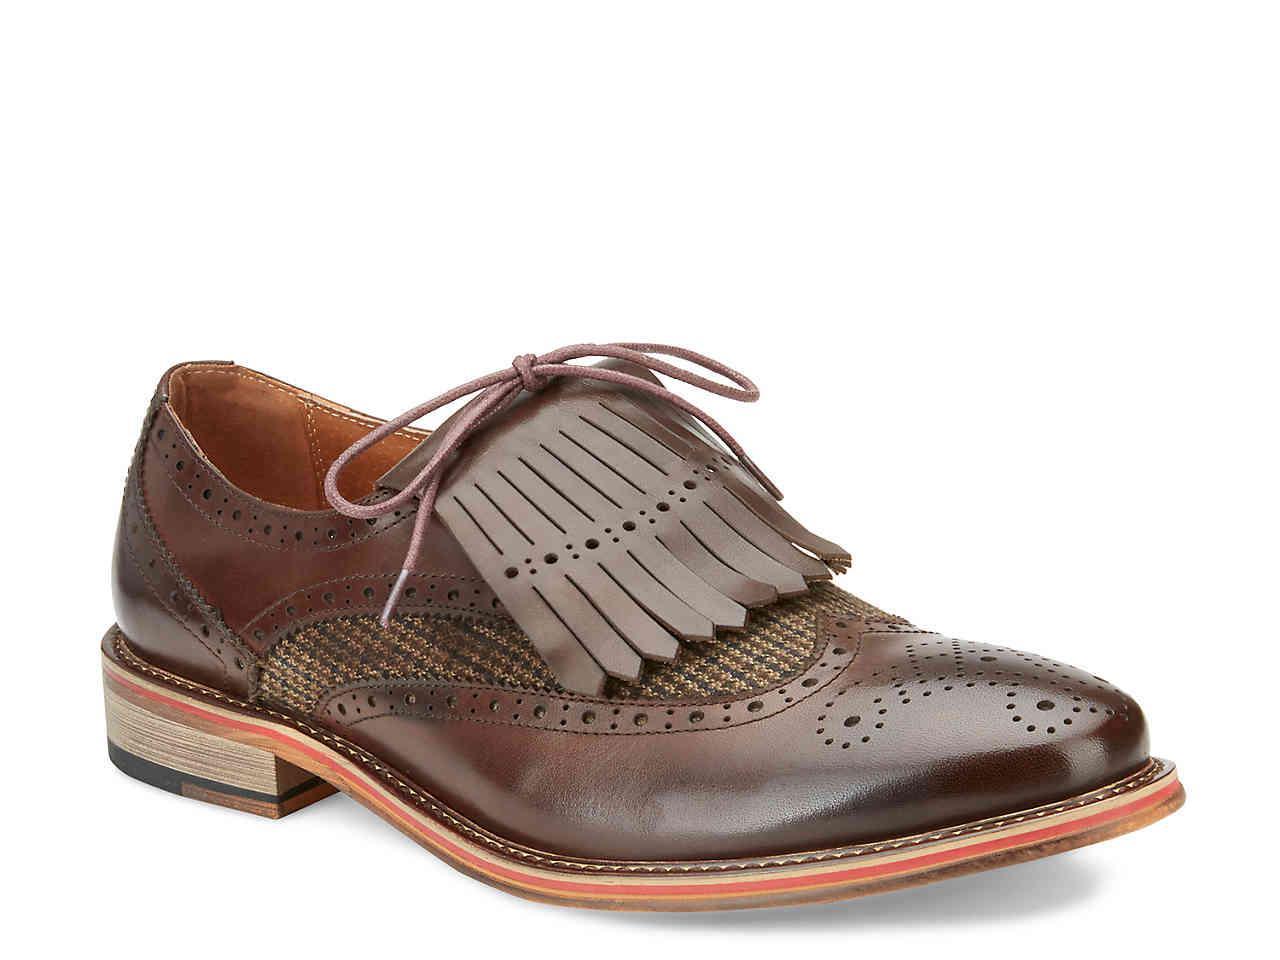 a436e7624 Lyst - Vintage Foundry Co. Kentye Wingtip Oxford in Brown for Men